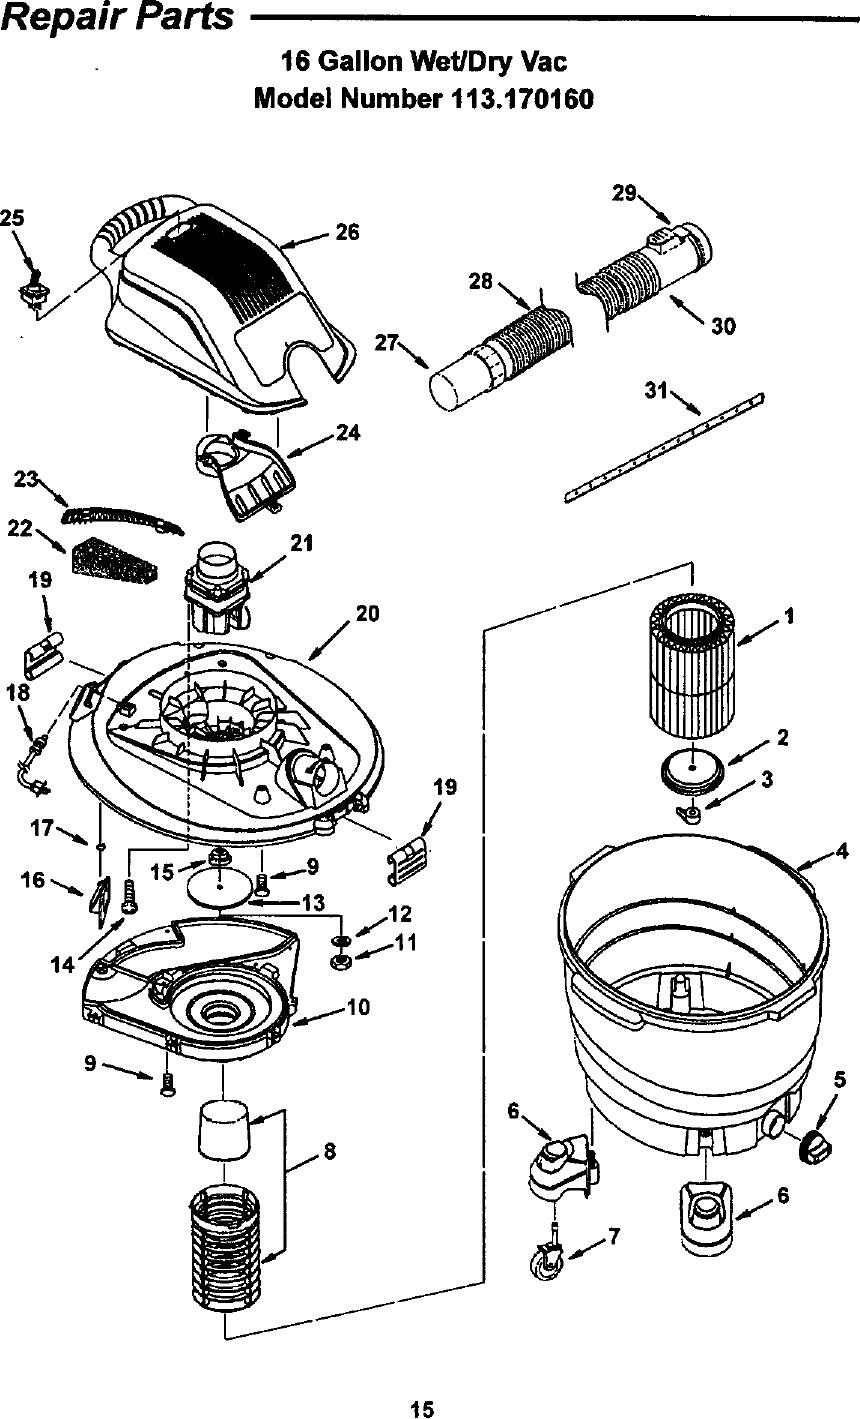 Craftsman 113170160 User Manual 16 GALLON CONVERTIBLE WET